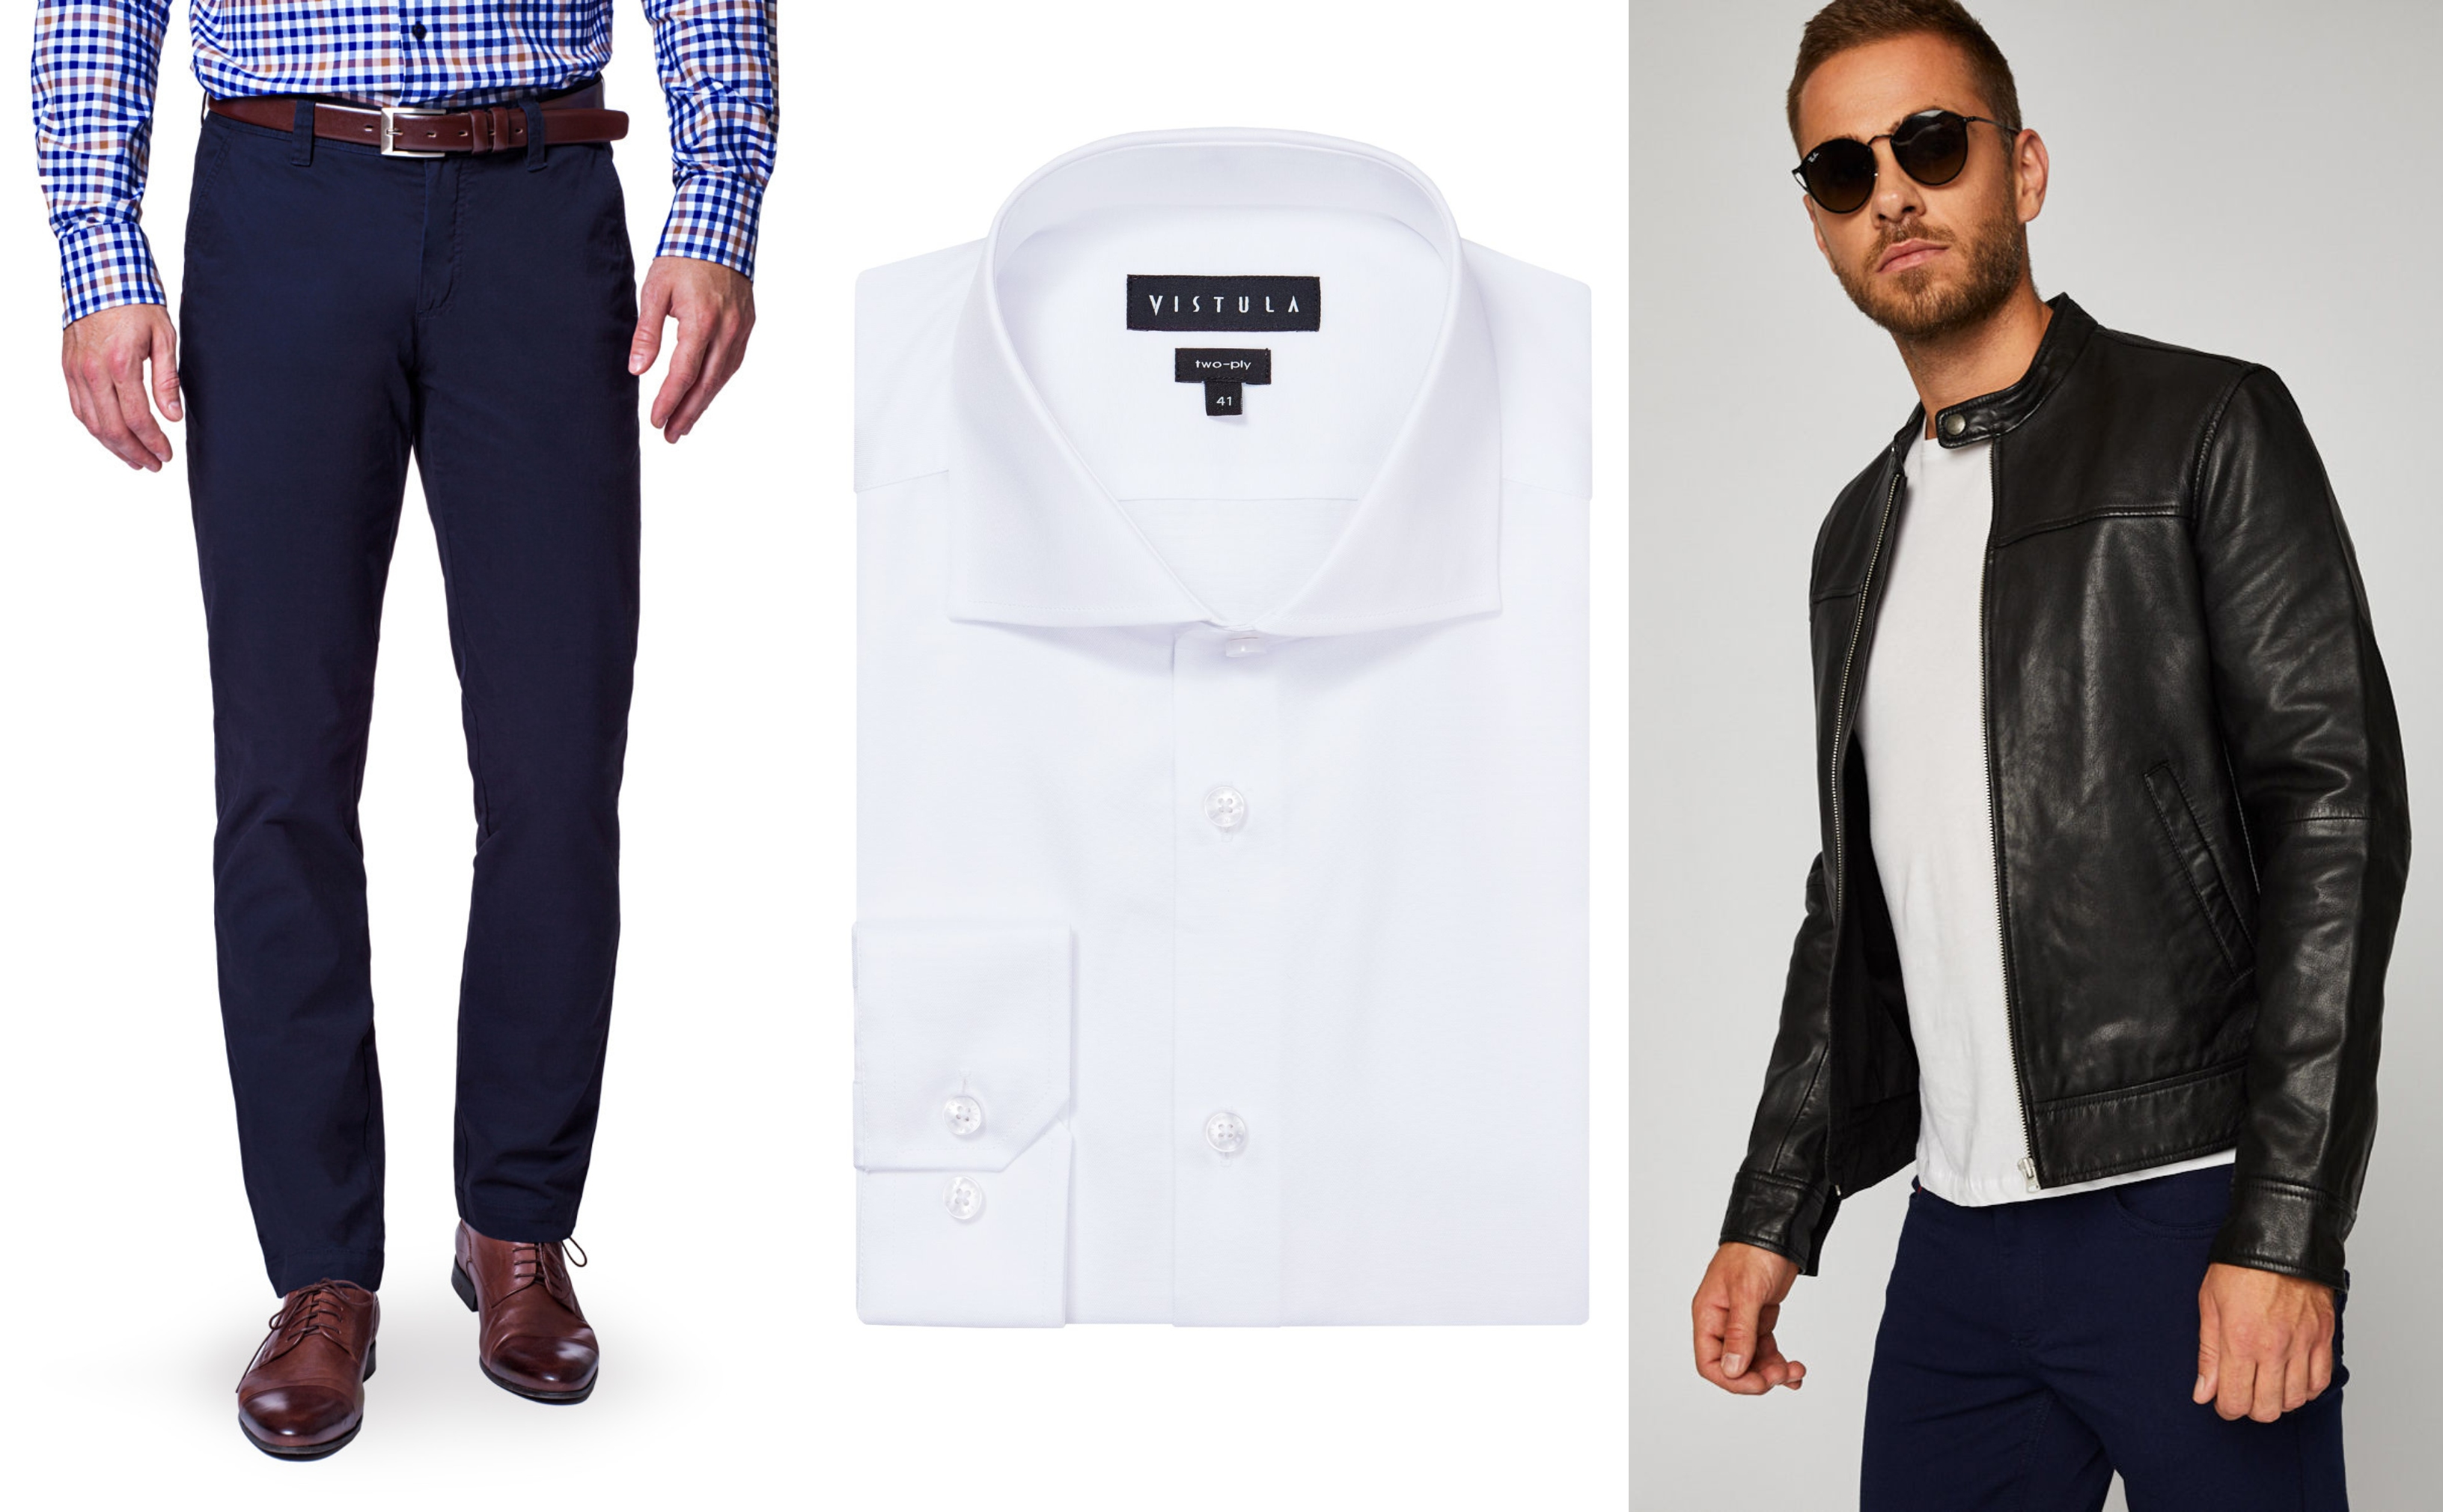 Jak kupić dobrą koszulę. Krótki poradnik WP Facet